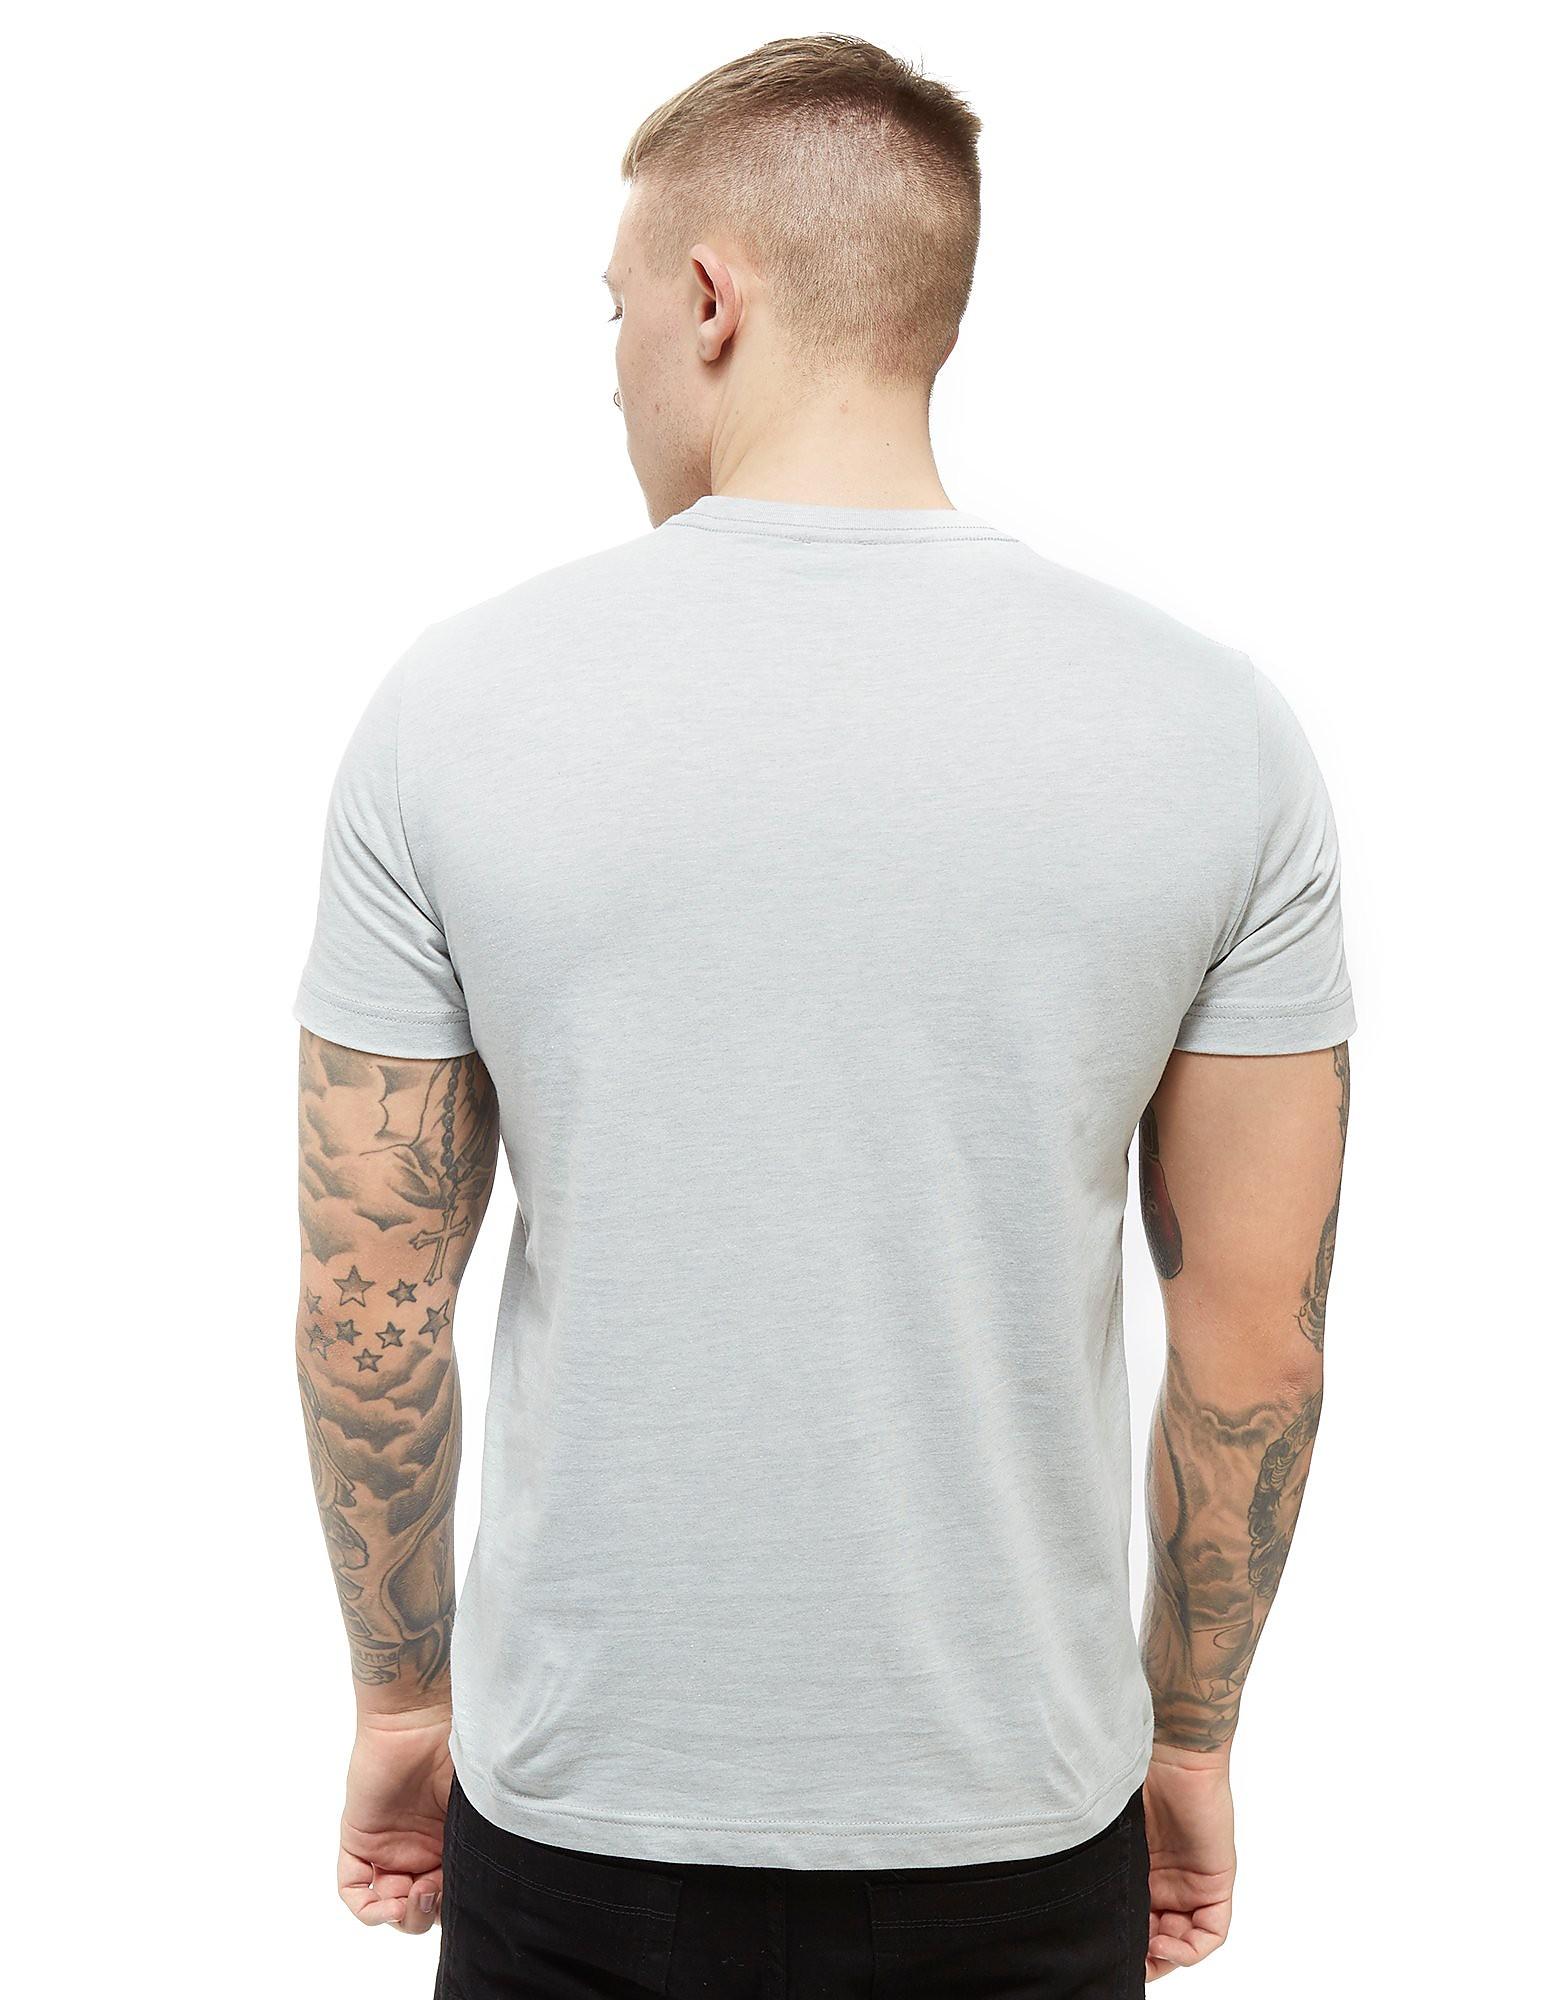 Emporio Armani EA7 Central Eagle Print T-Shirt